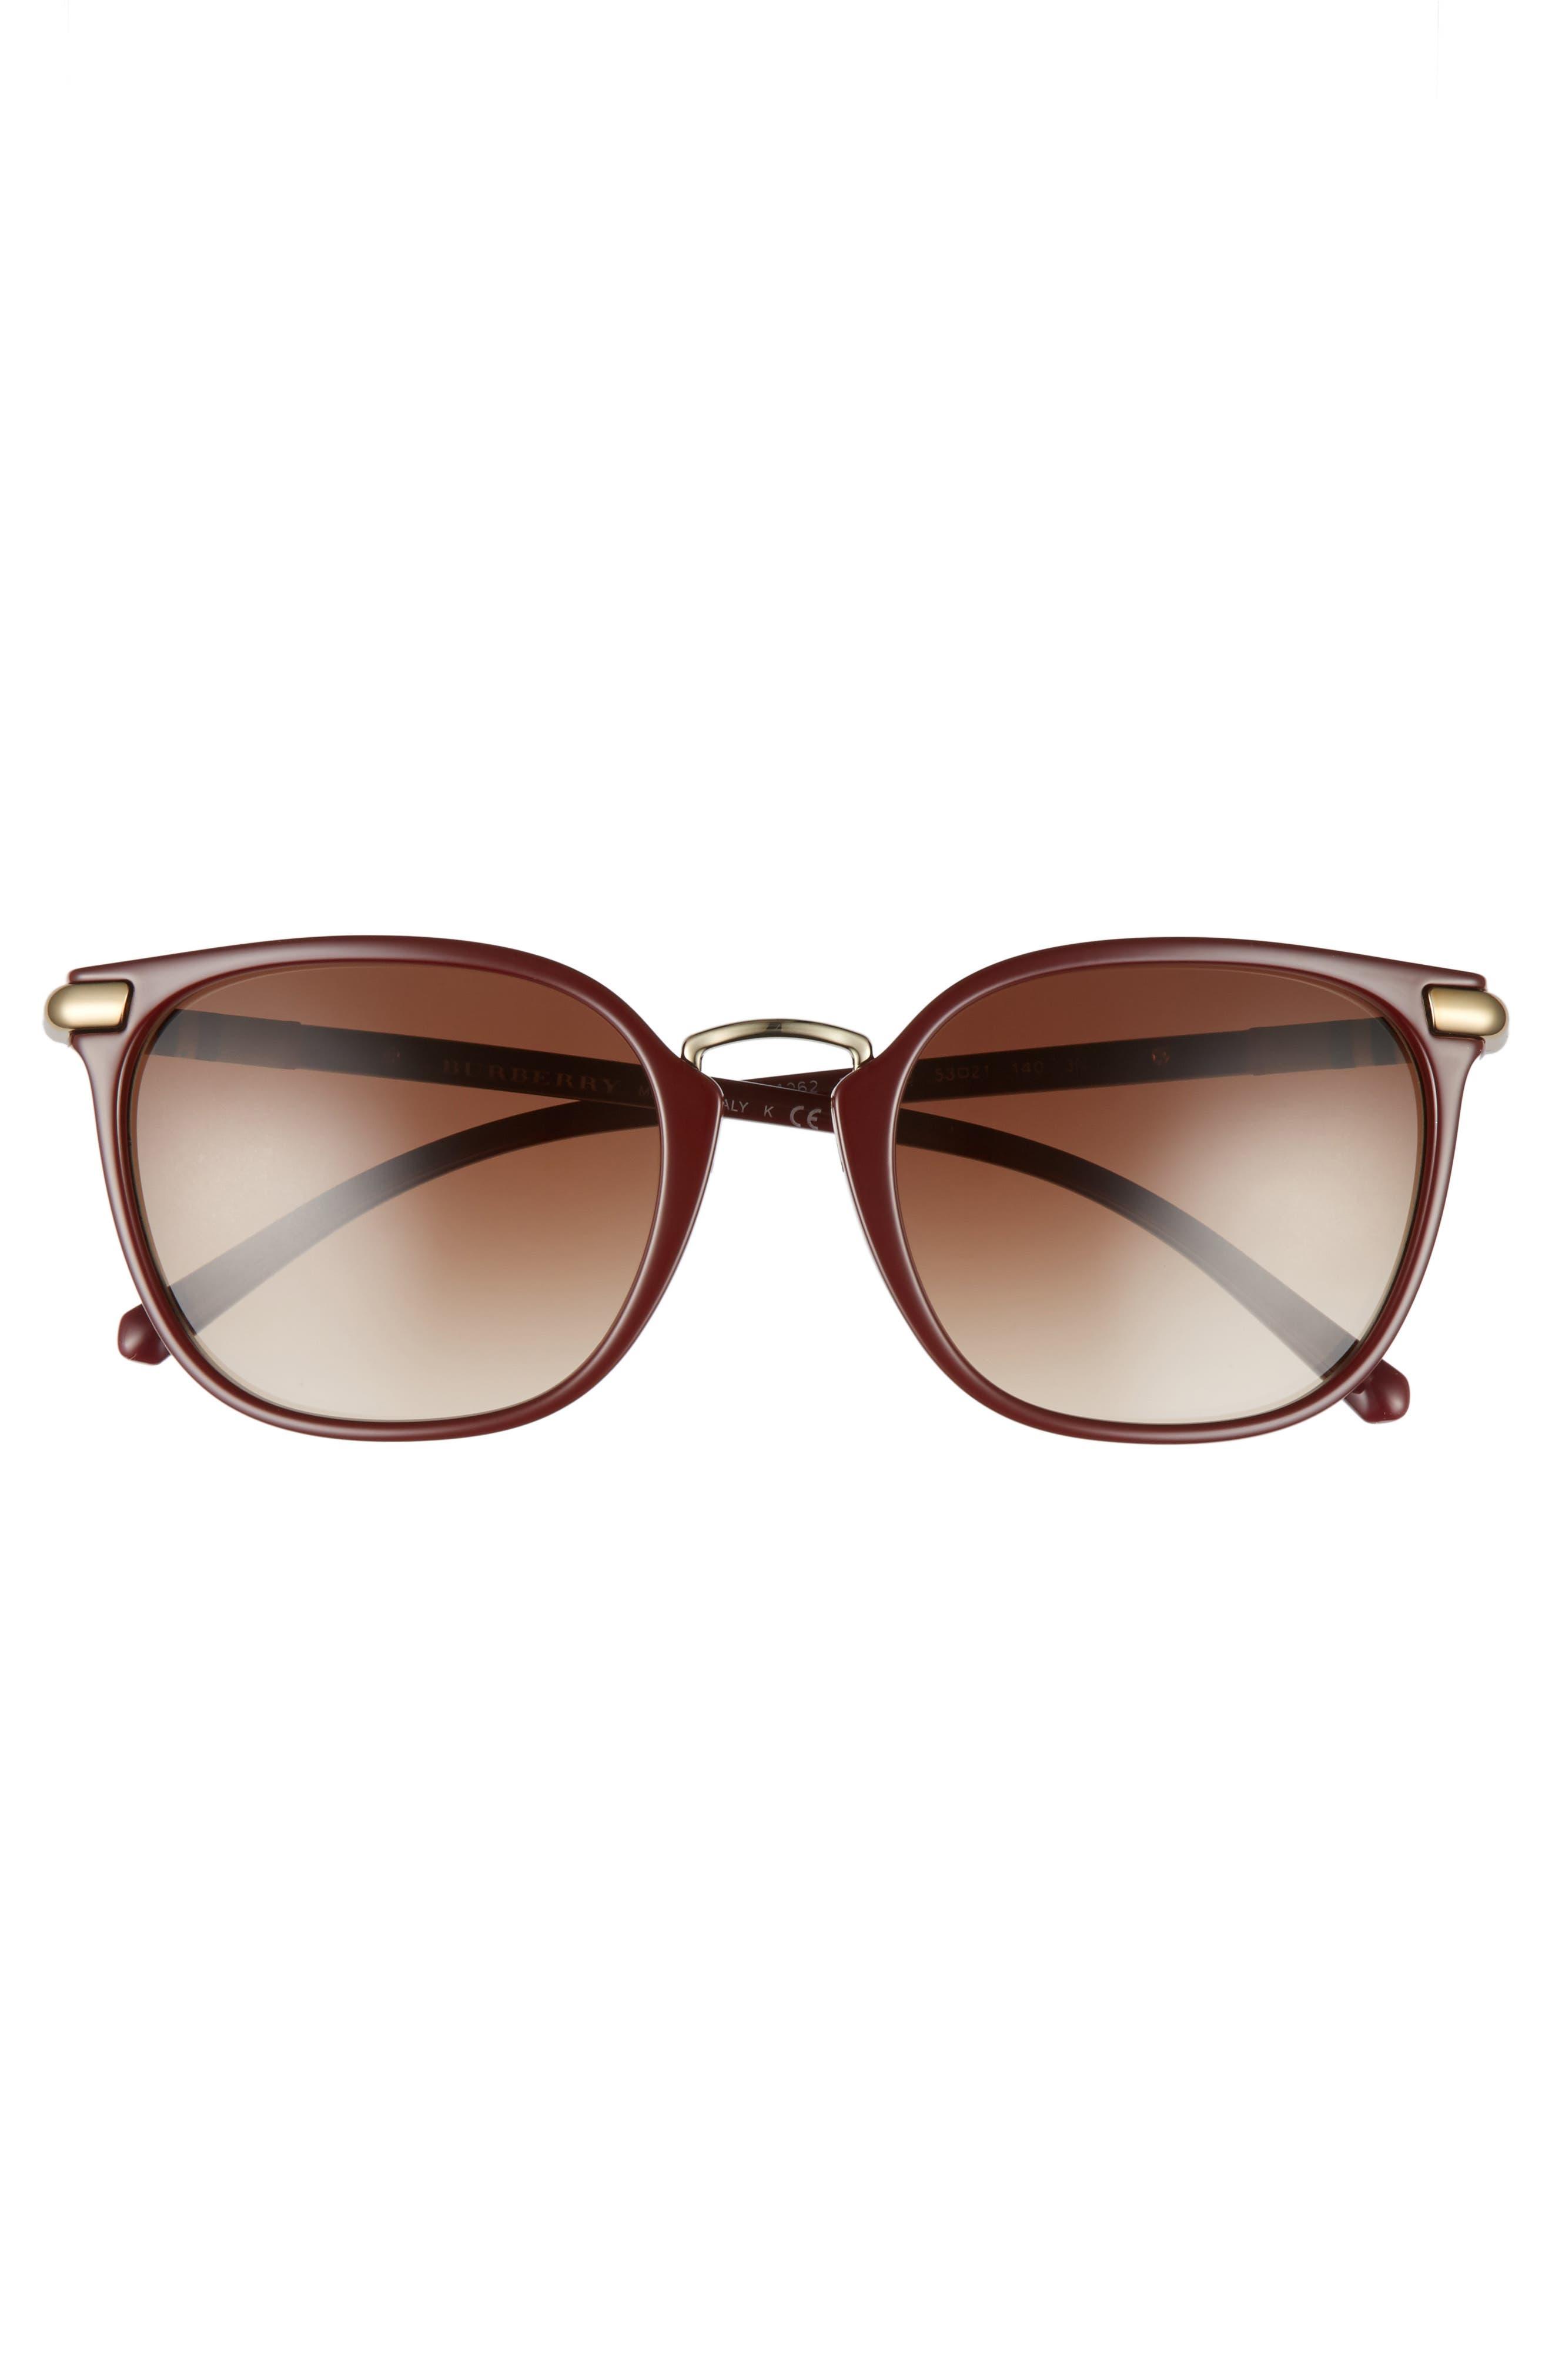 53mm Gradient Square Sunglasses,                             Alternate thumbnail 12, color,